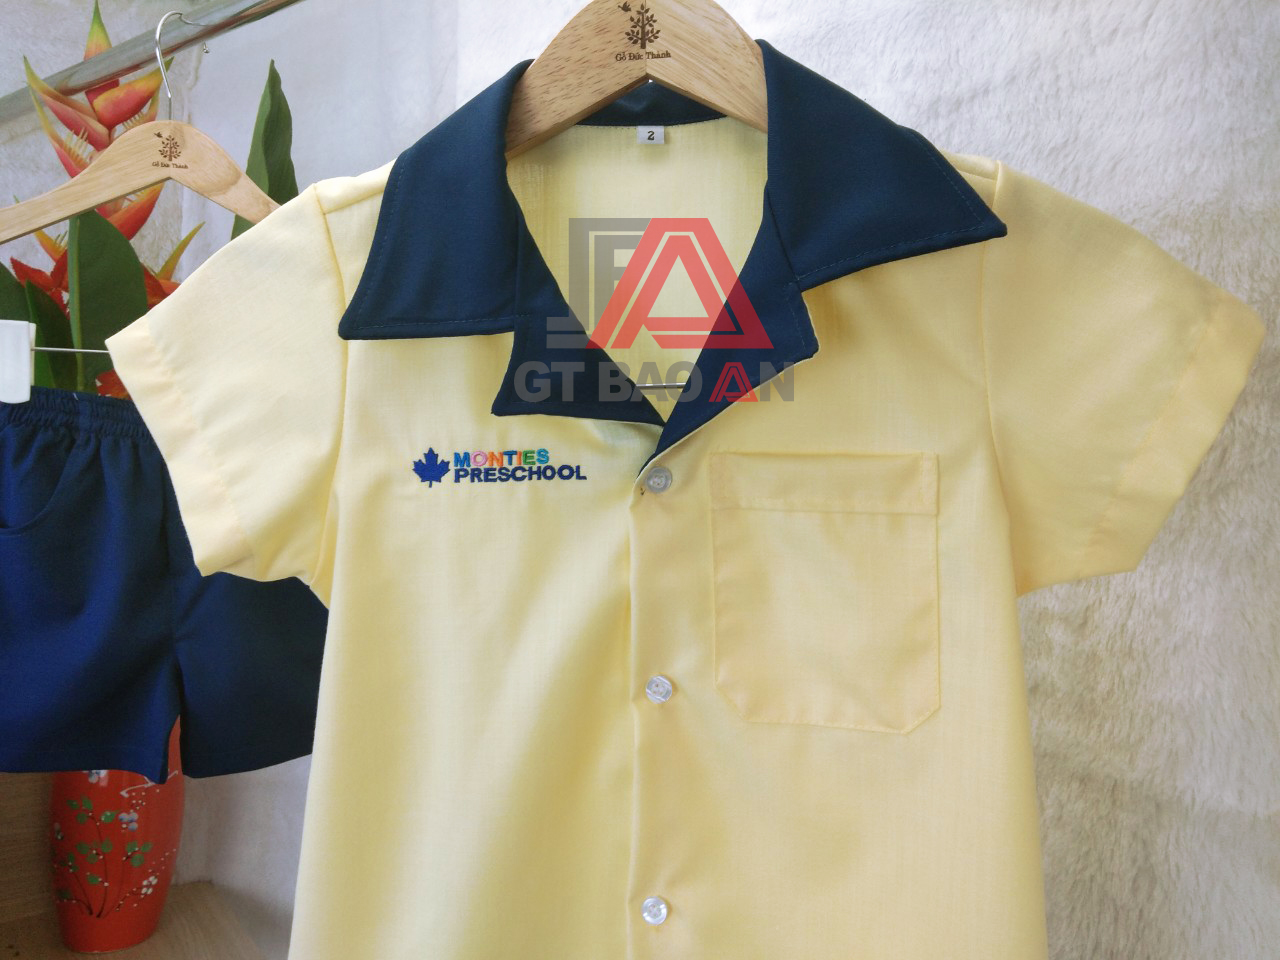 Đồng phục mầm non Monties Preschool